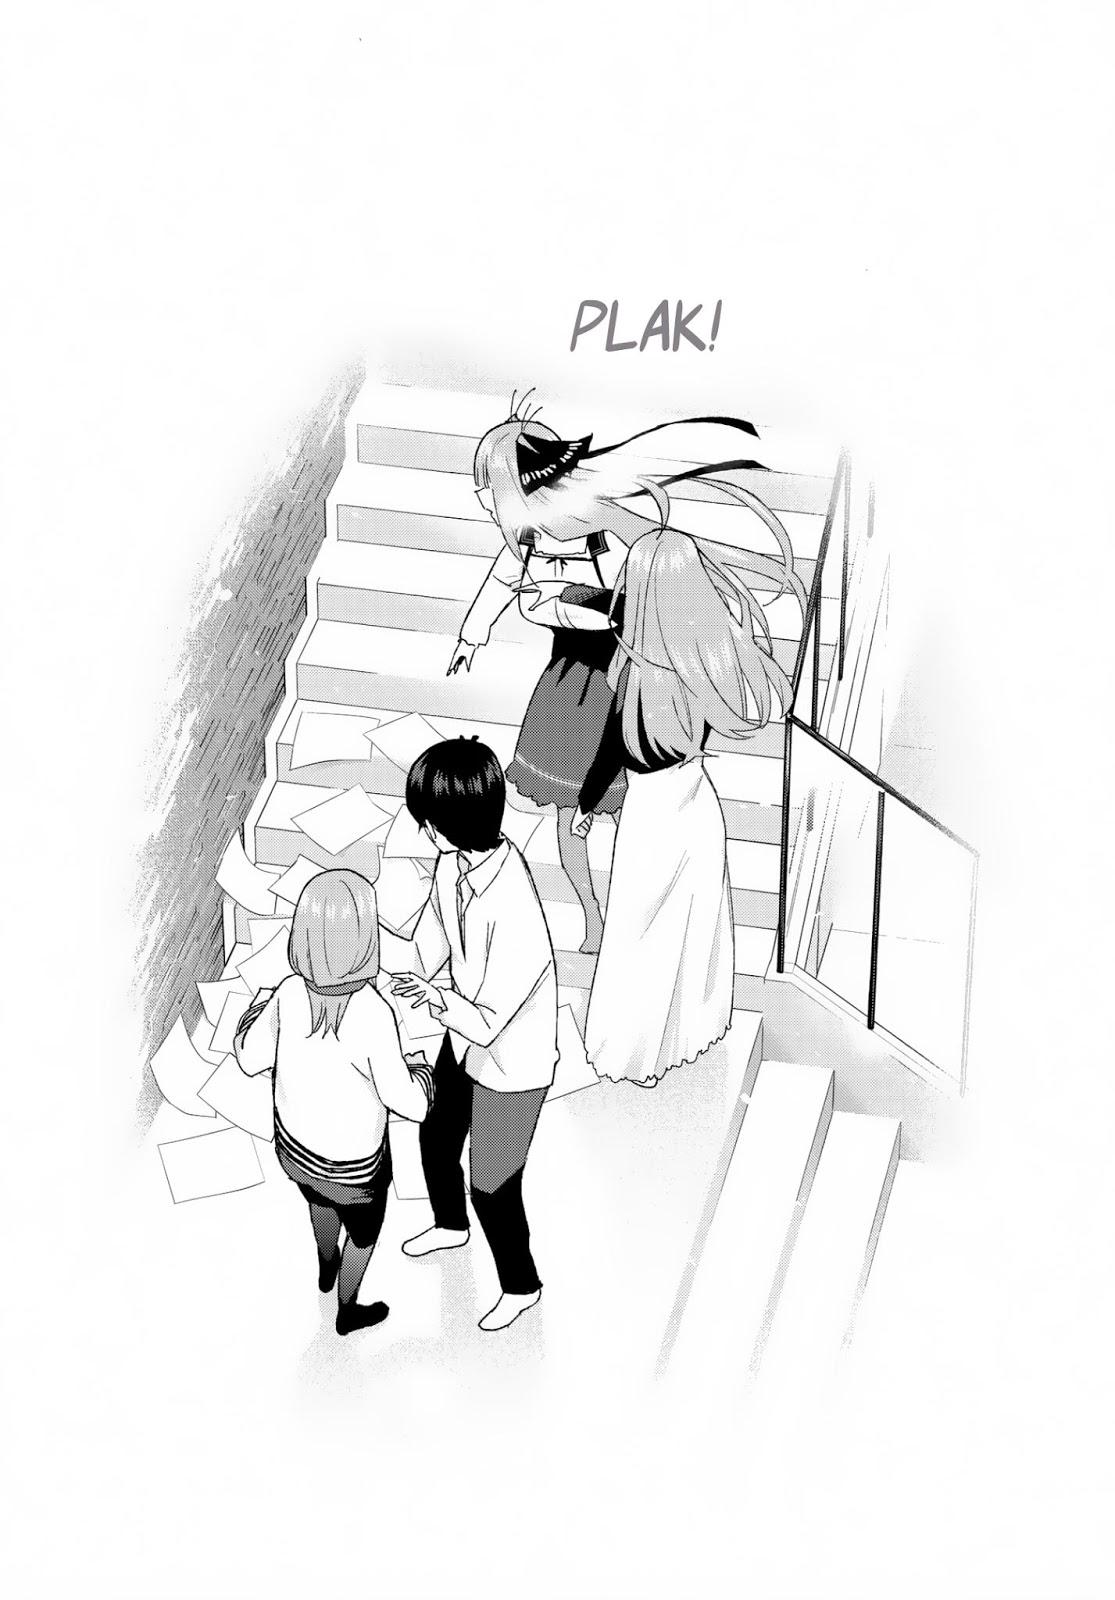 Komik go toubun no hanayome 039 - chapter 39 40 Indonesia go toubun no hanayome 039 - chapter 39 Terbaru 21|Baca Manga Komik Indonesia